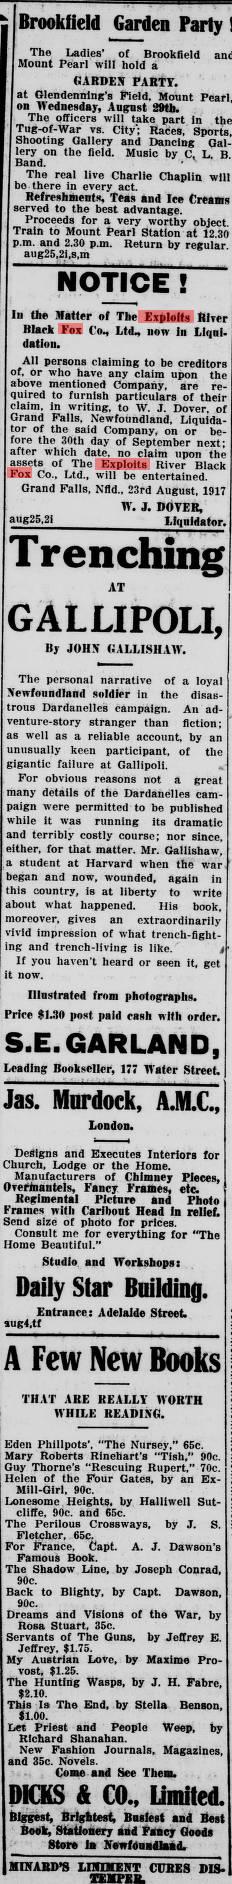 Evening Telegram (St. John's, N.L.), 1917-08-27 Adv. 7 Page 11 Exploits River Balck Fox Co